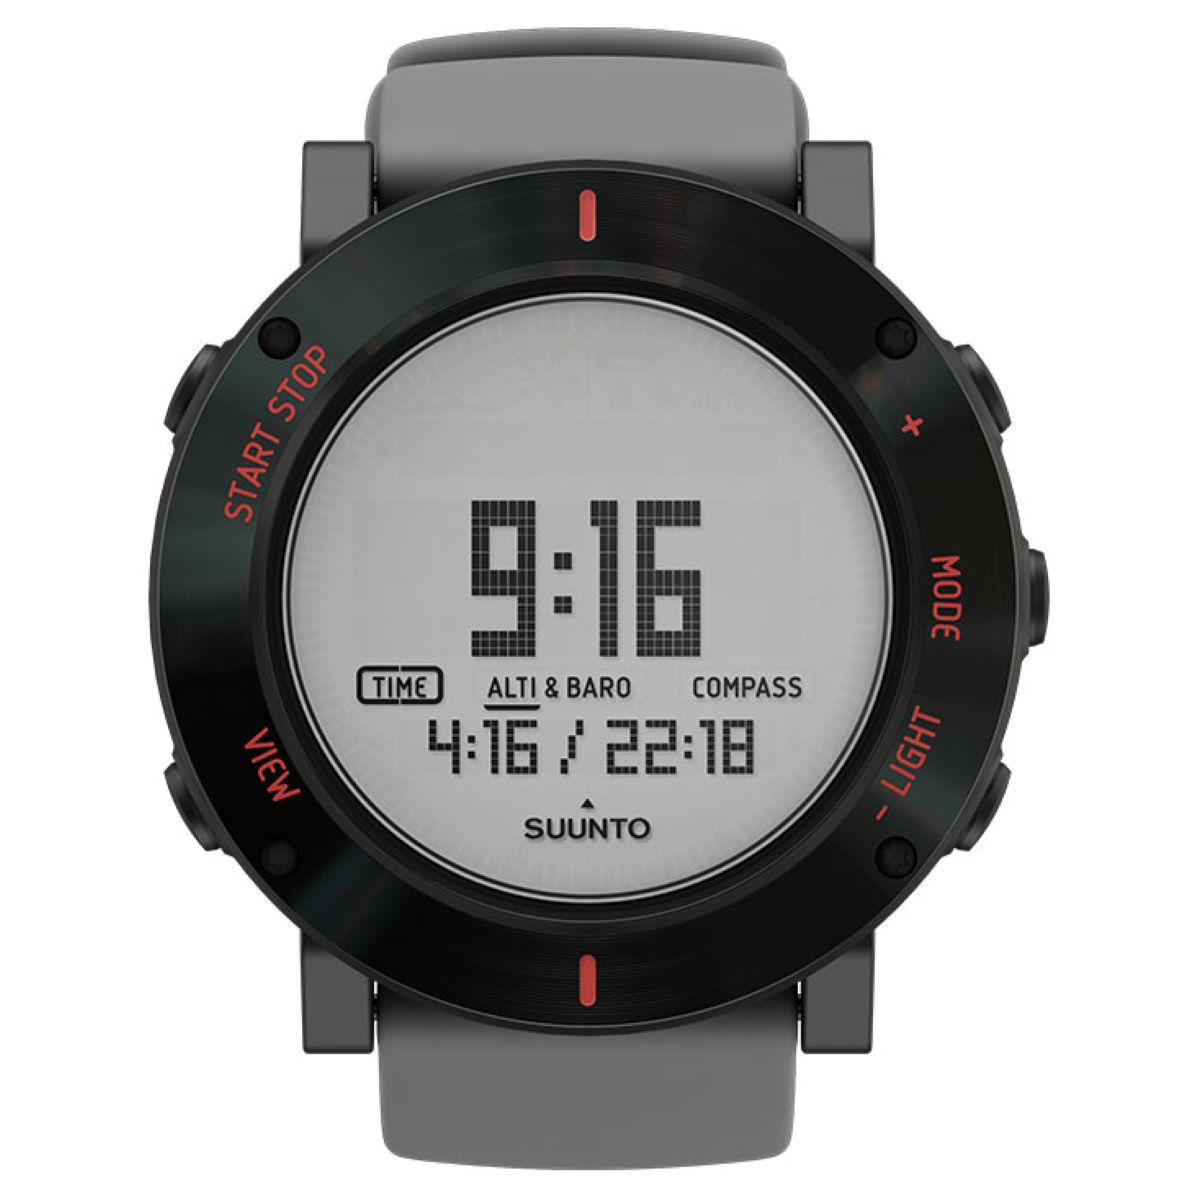 Reloj deportivo Suunto Core Crush (con cargador portátil Power Monkey) - Relojes deportivos